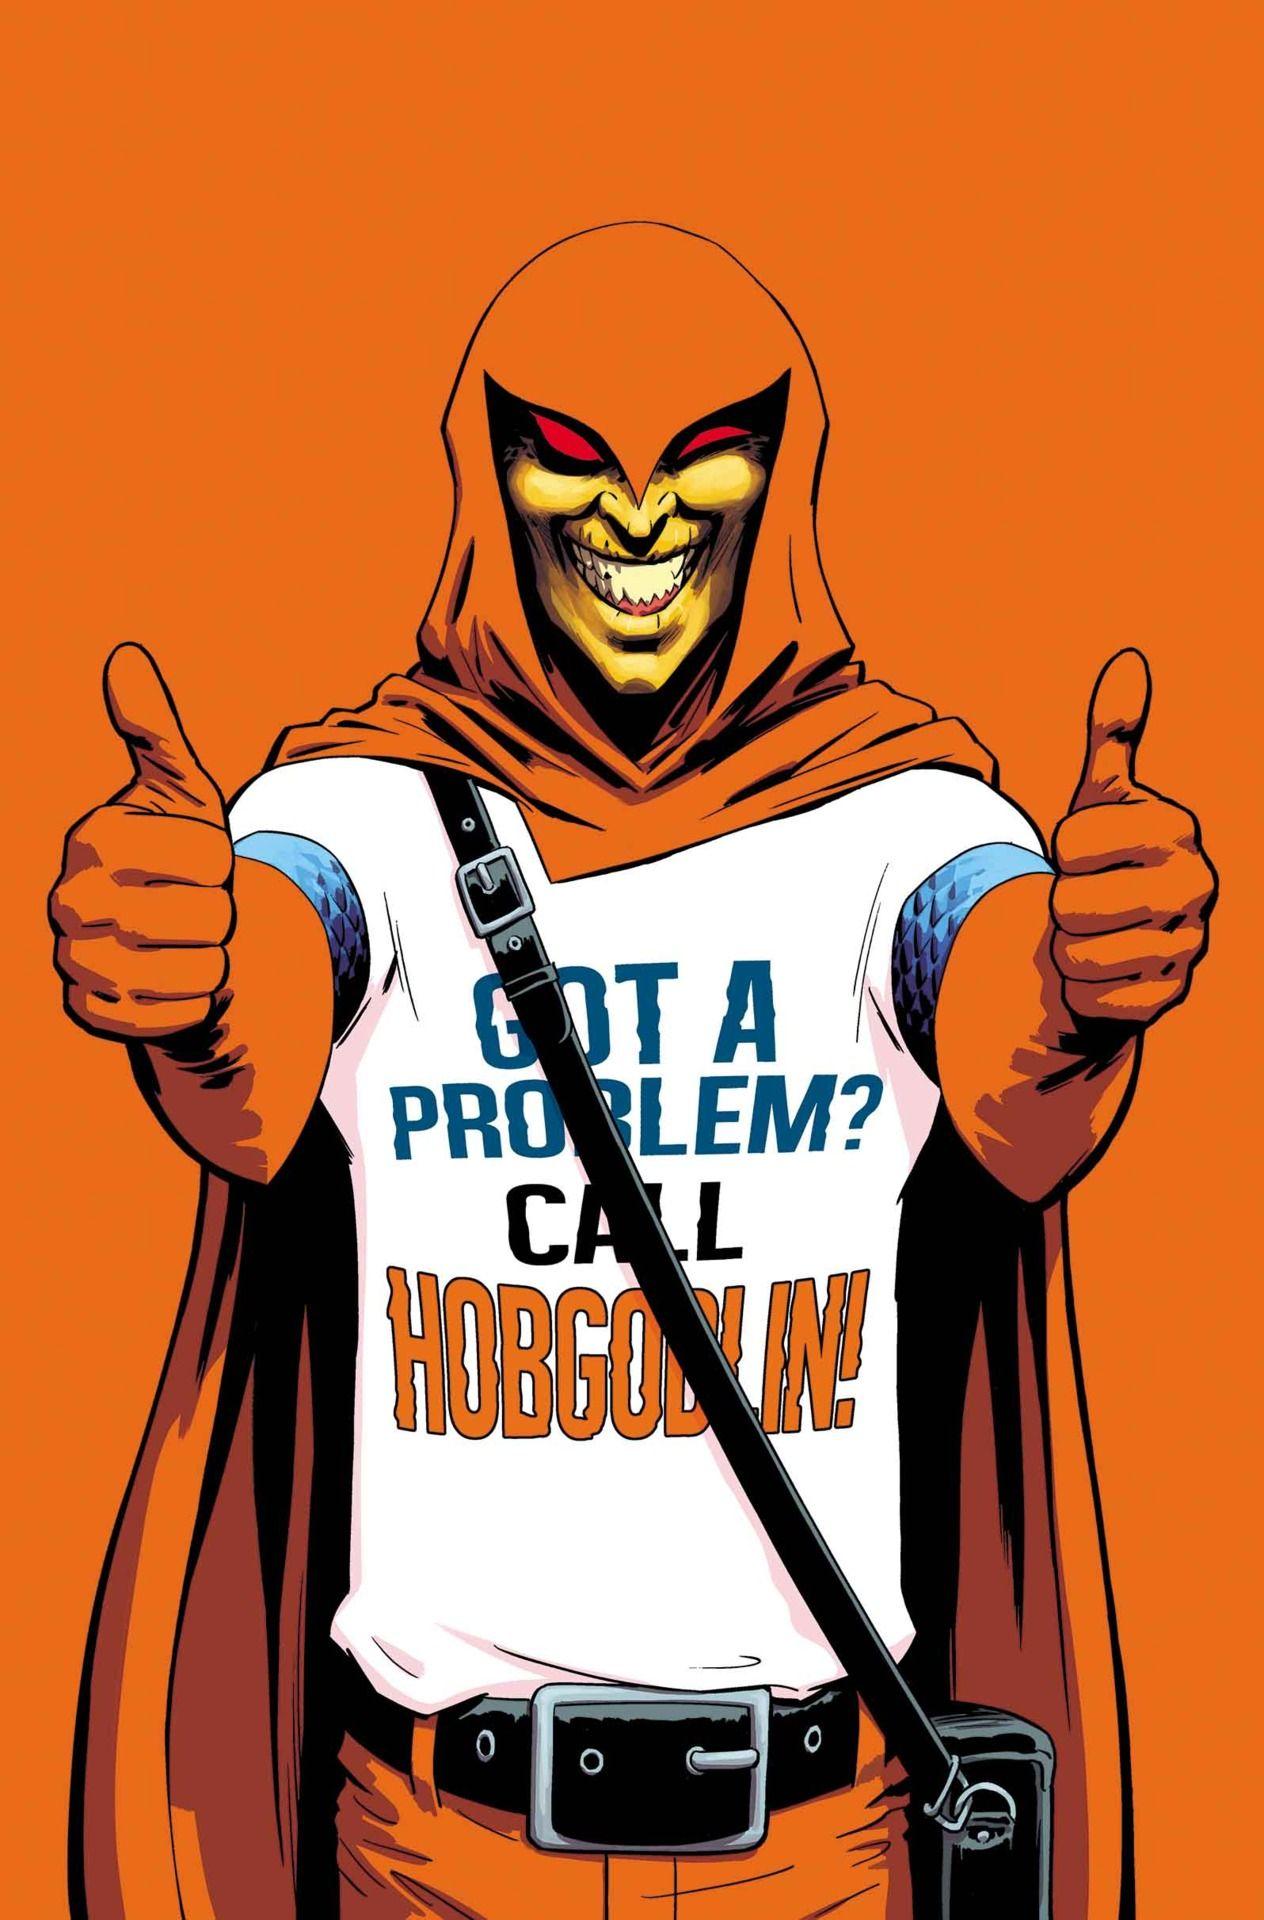 Axis: Hobgoblin #2 (of 3) - Javier Rodriguez